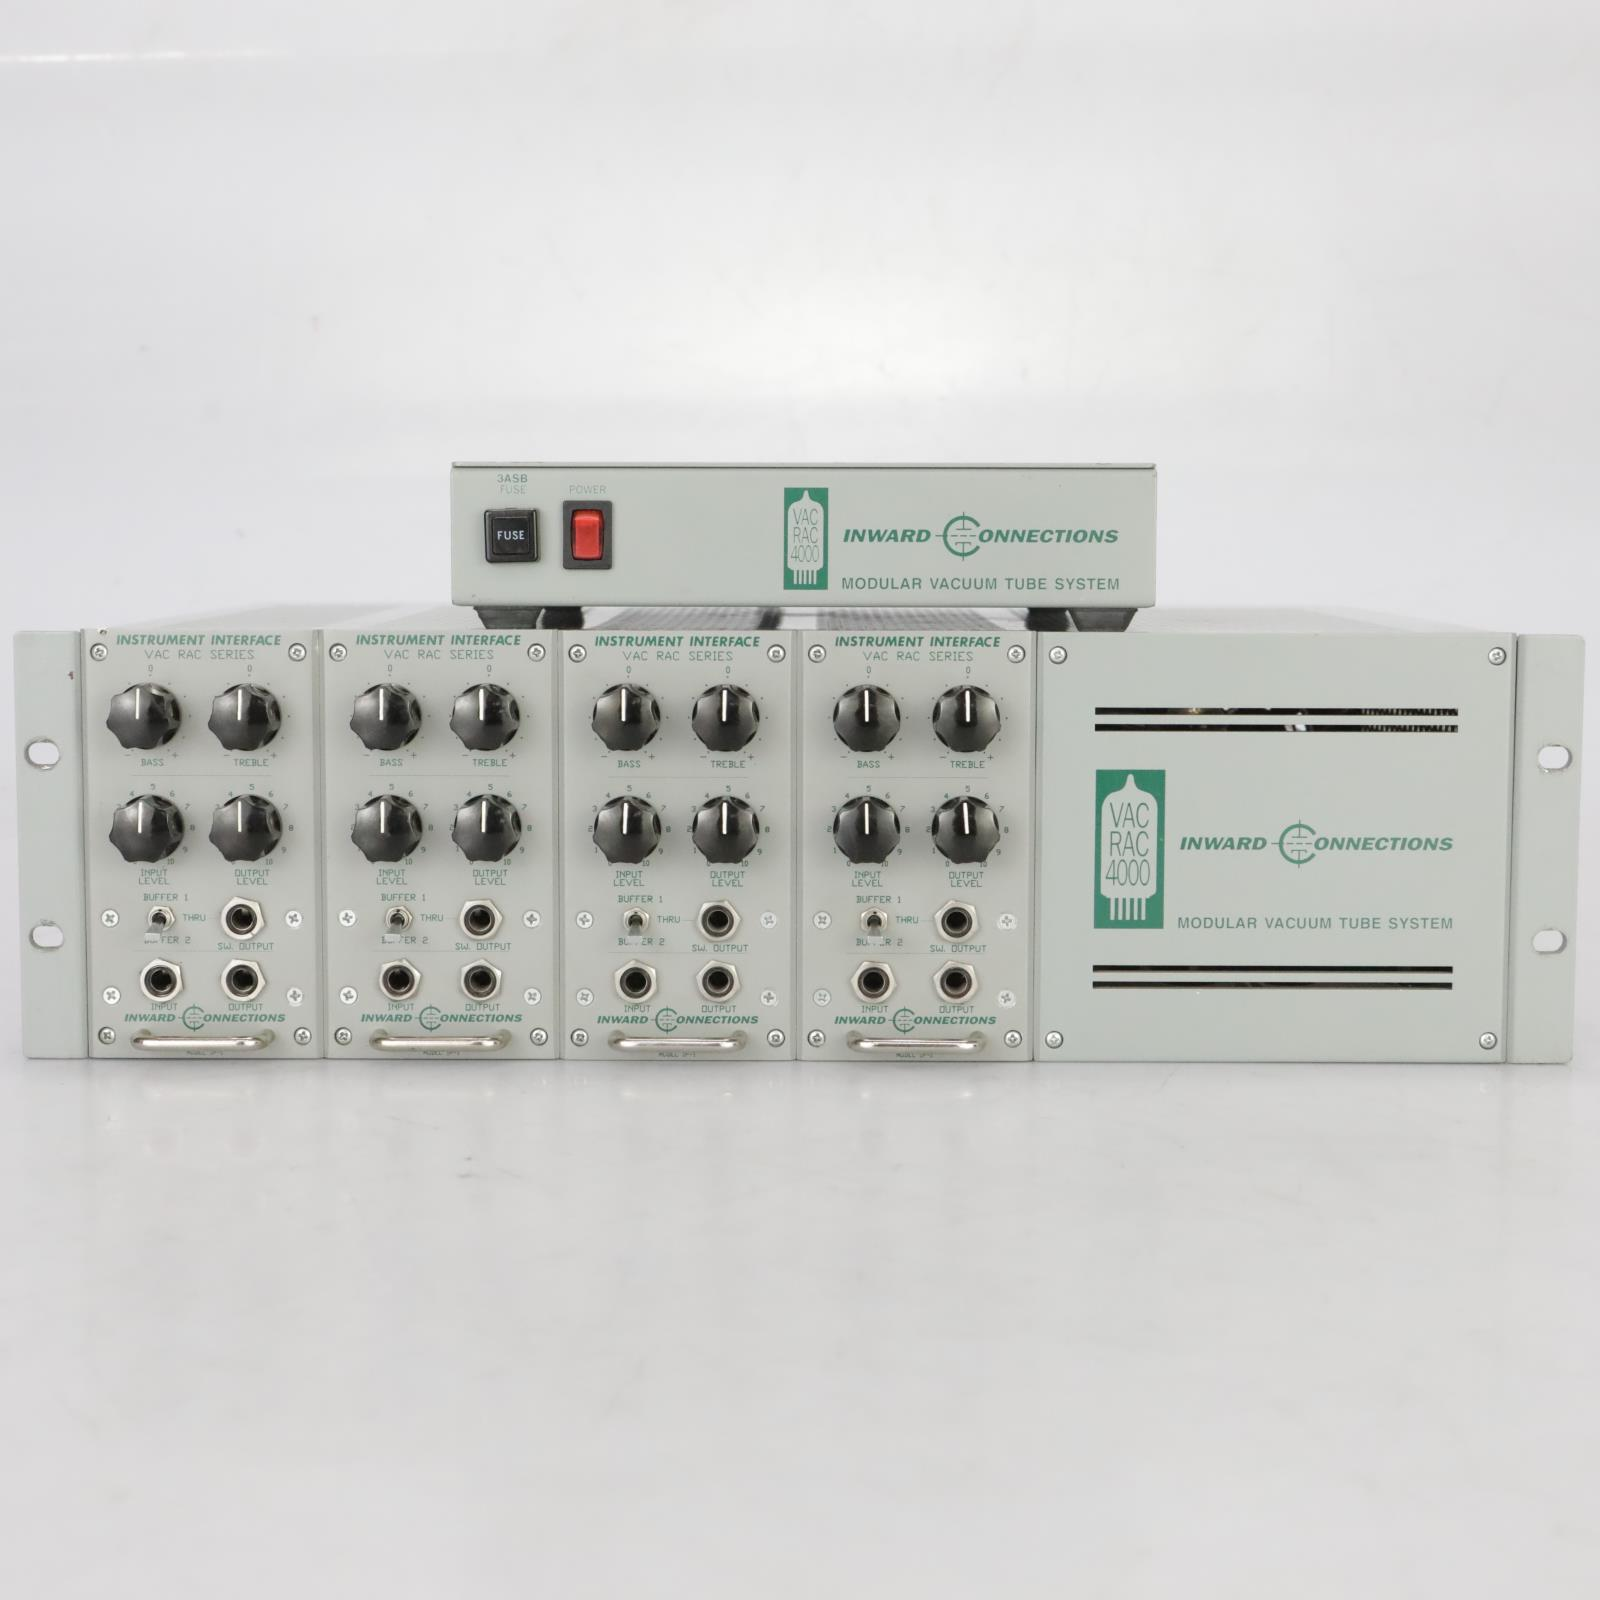 Inward Connections VAC RAC 4000 w/ 4 Instrument Interface Modules & PSU #37871